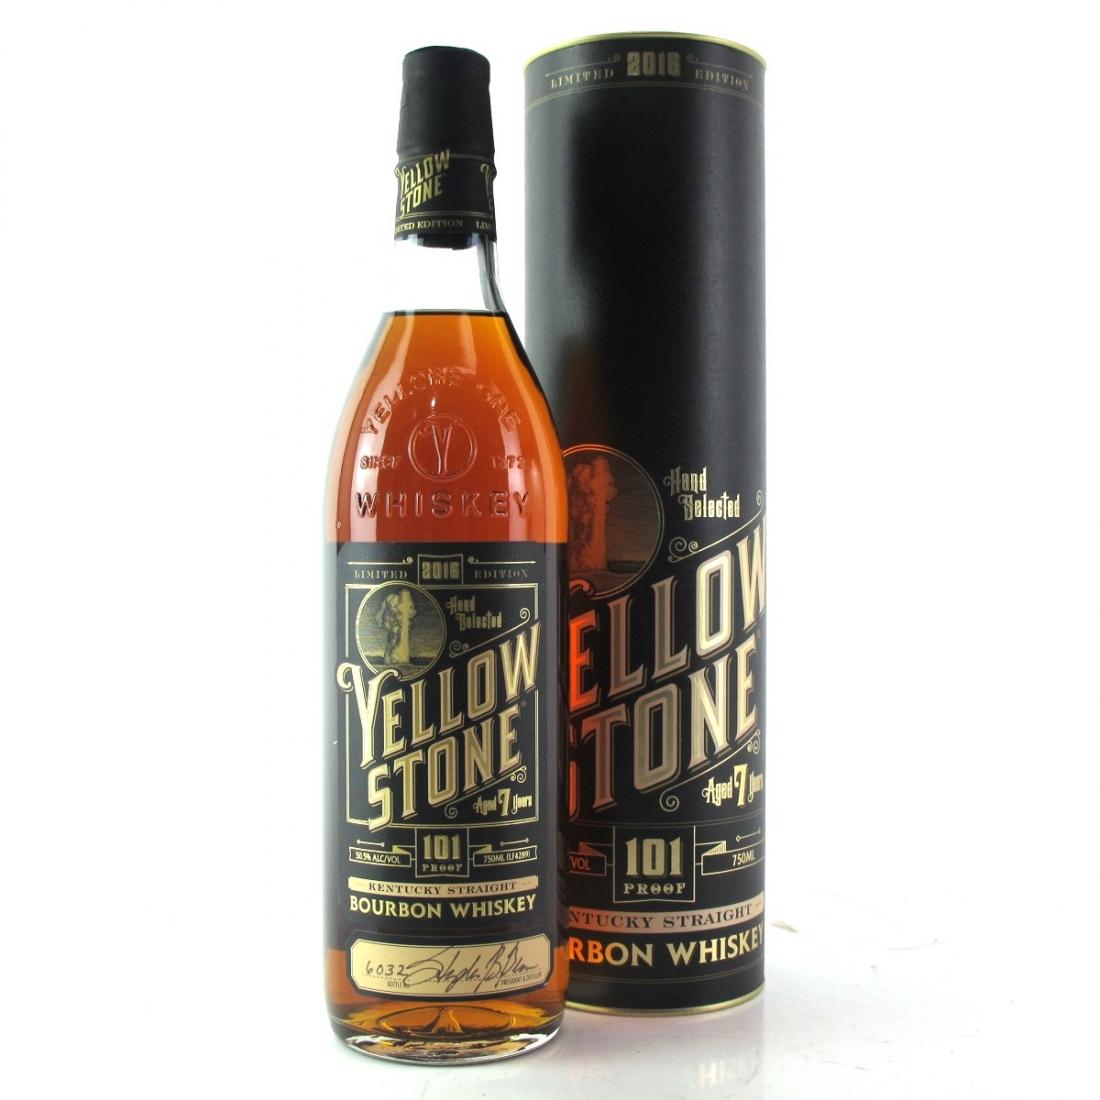 Yellowstone 7 Year Old Kentucky Straight Bourbon 101 Proof / 2016 Edition